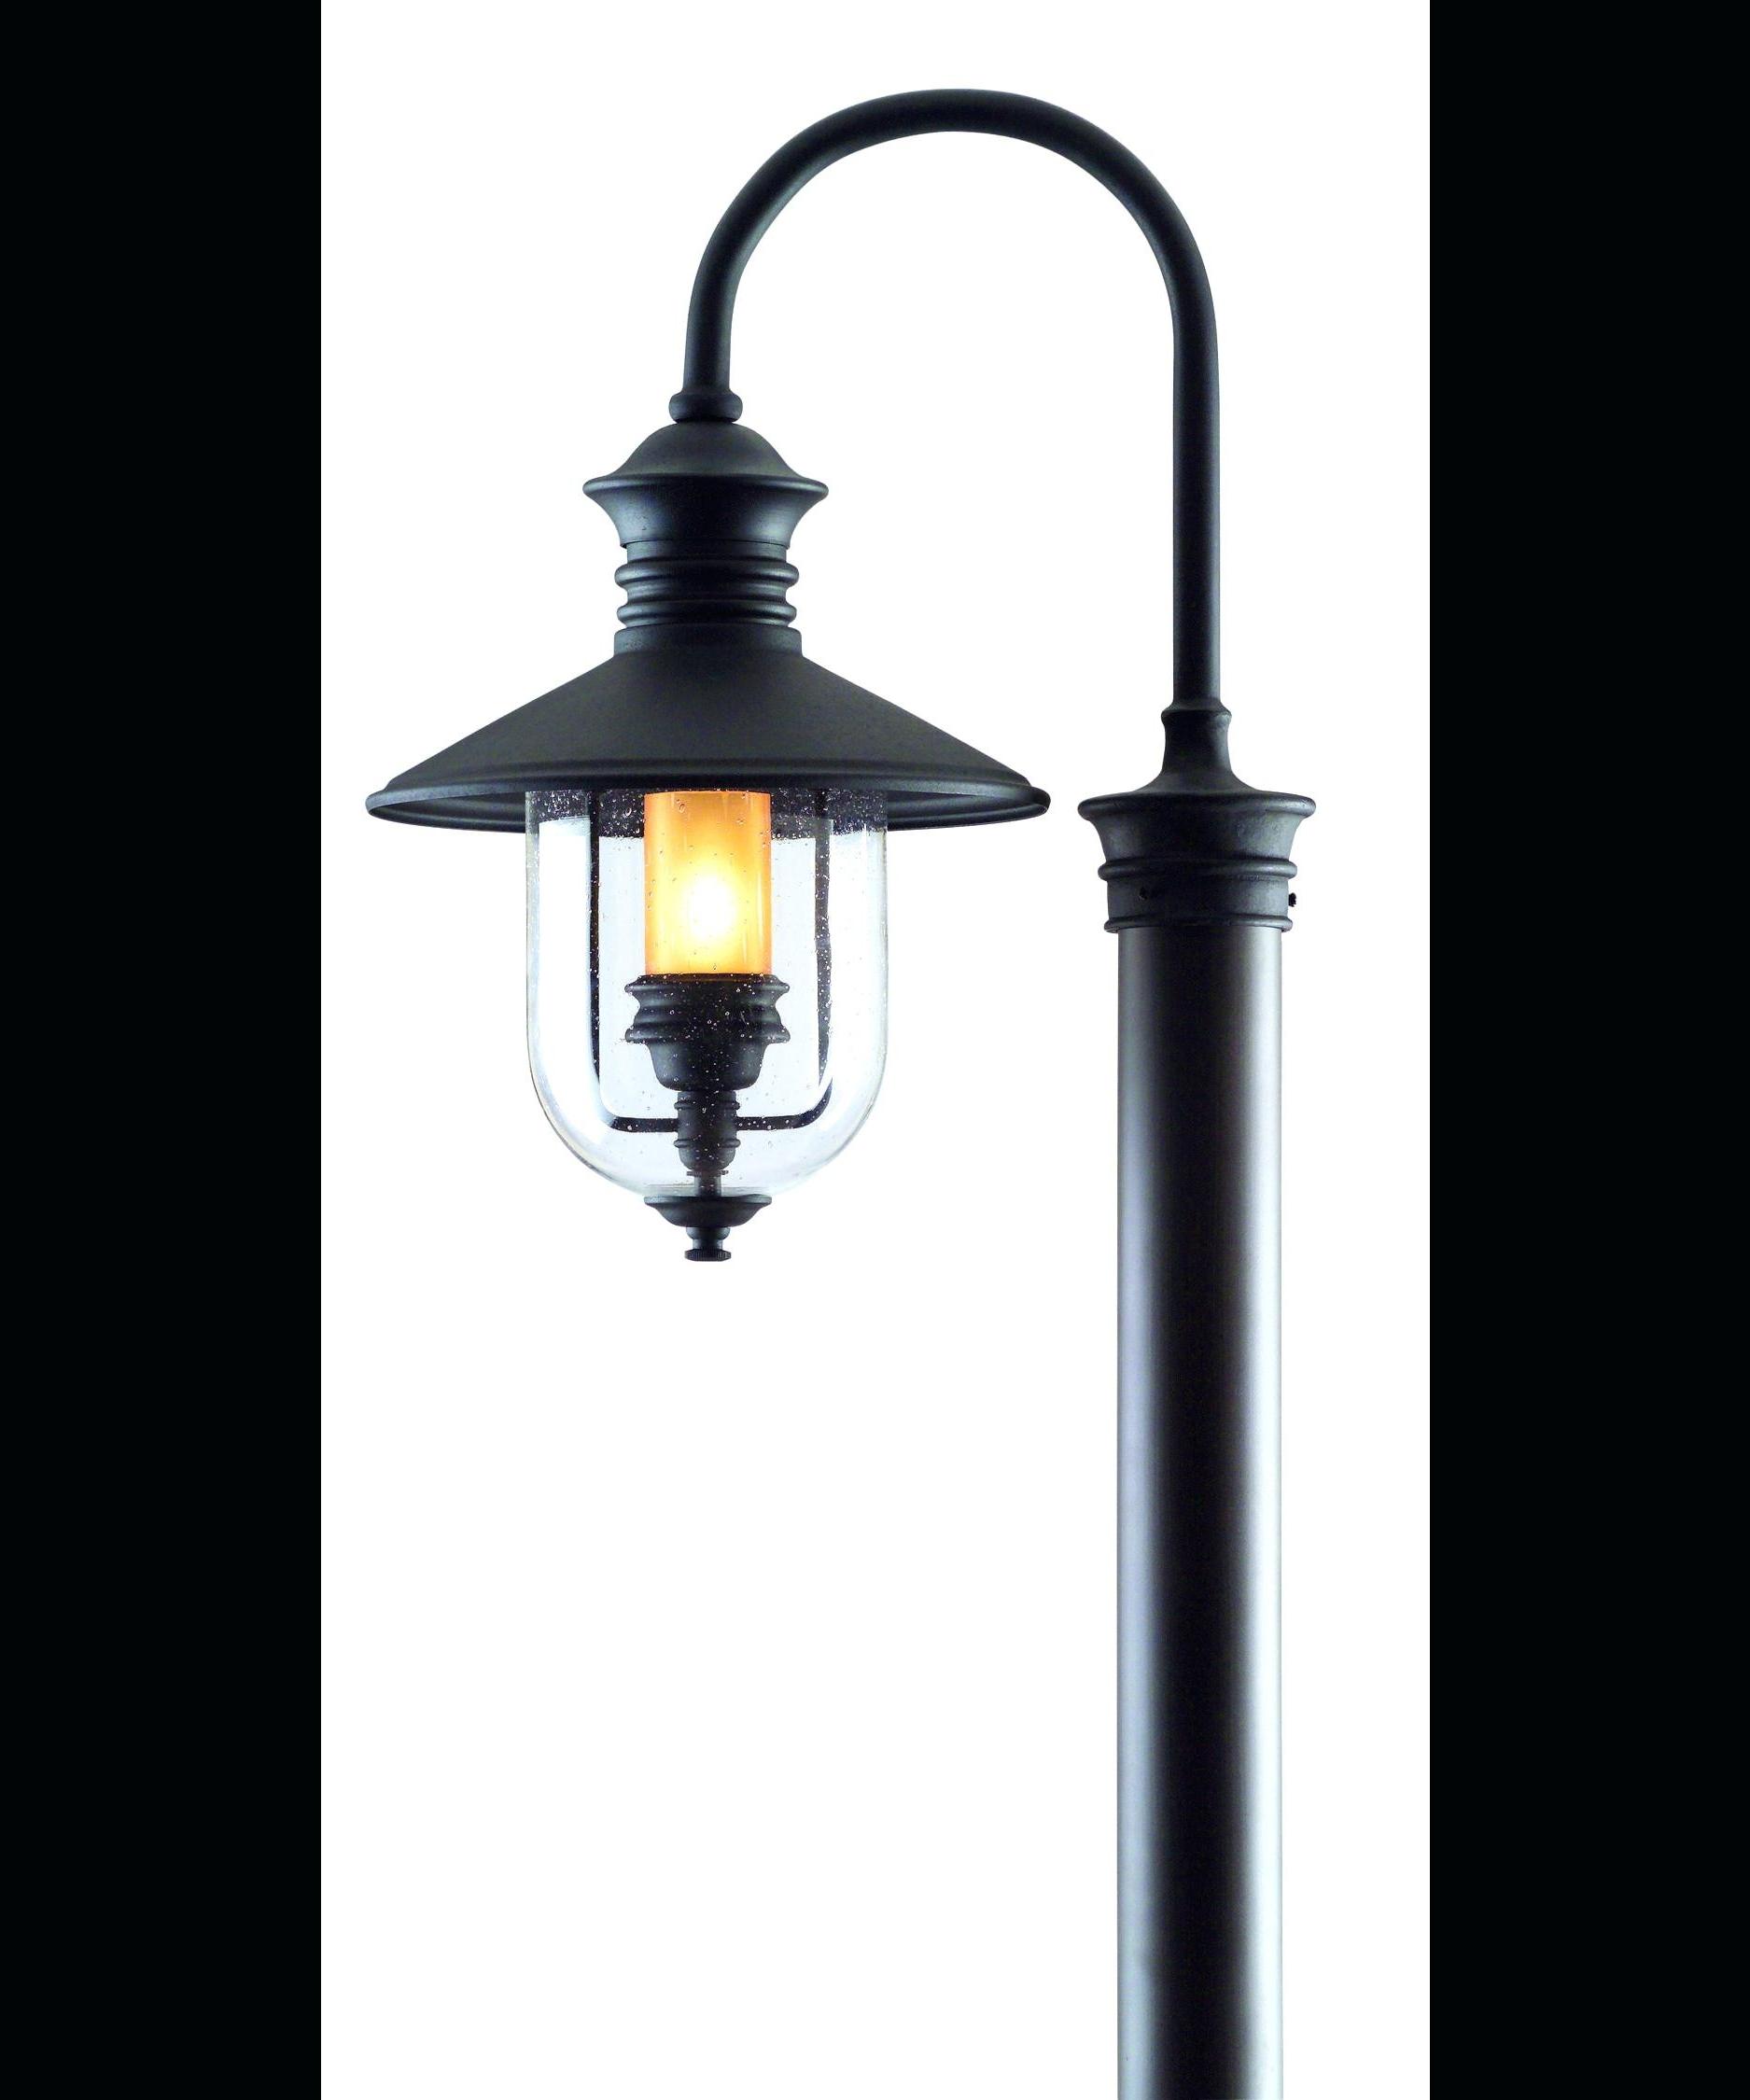 Fashionable Outdoor Lighting Post Lights – Outdoor Lighting Ideas For Outdoor Lanterns On Post (View 11 of 20)